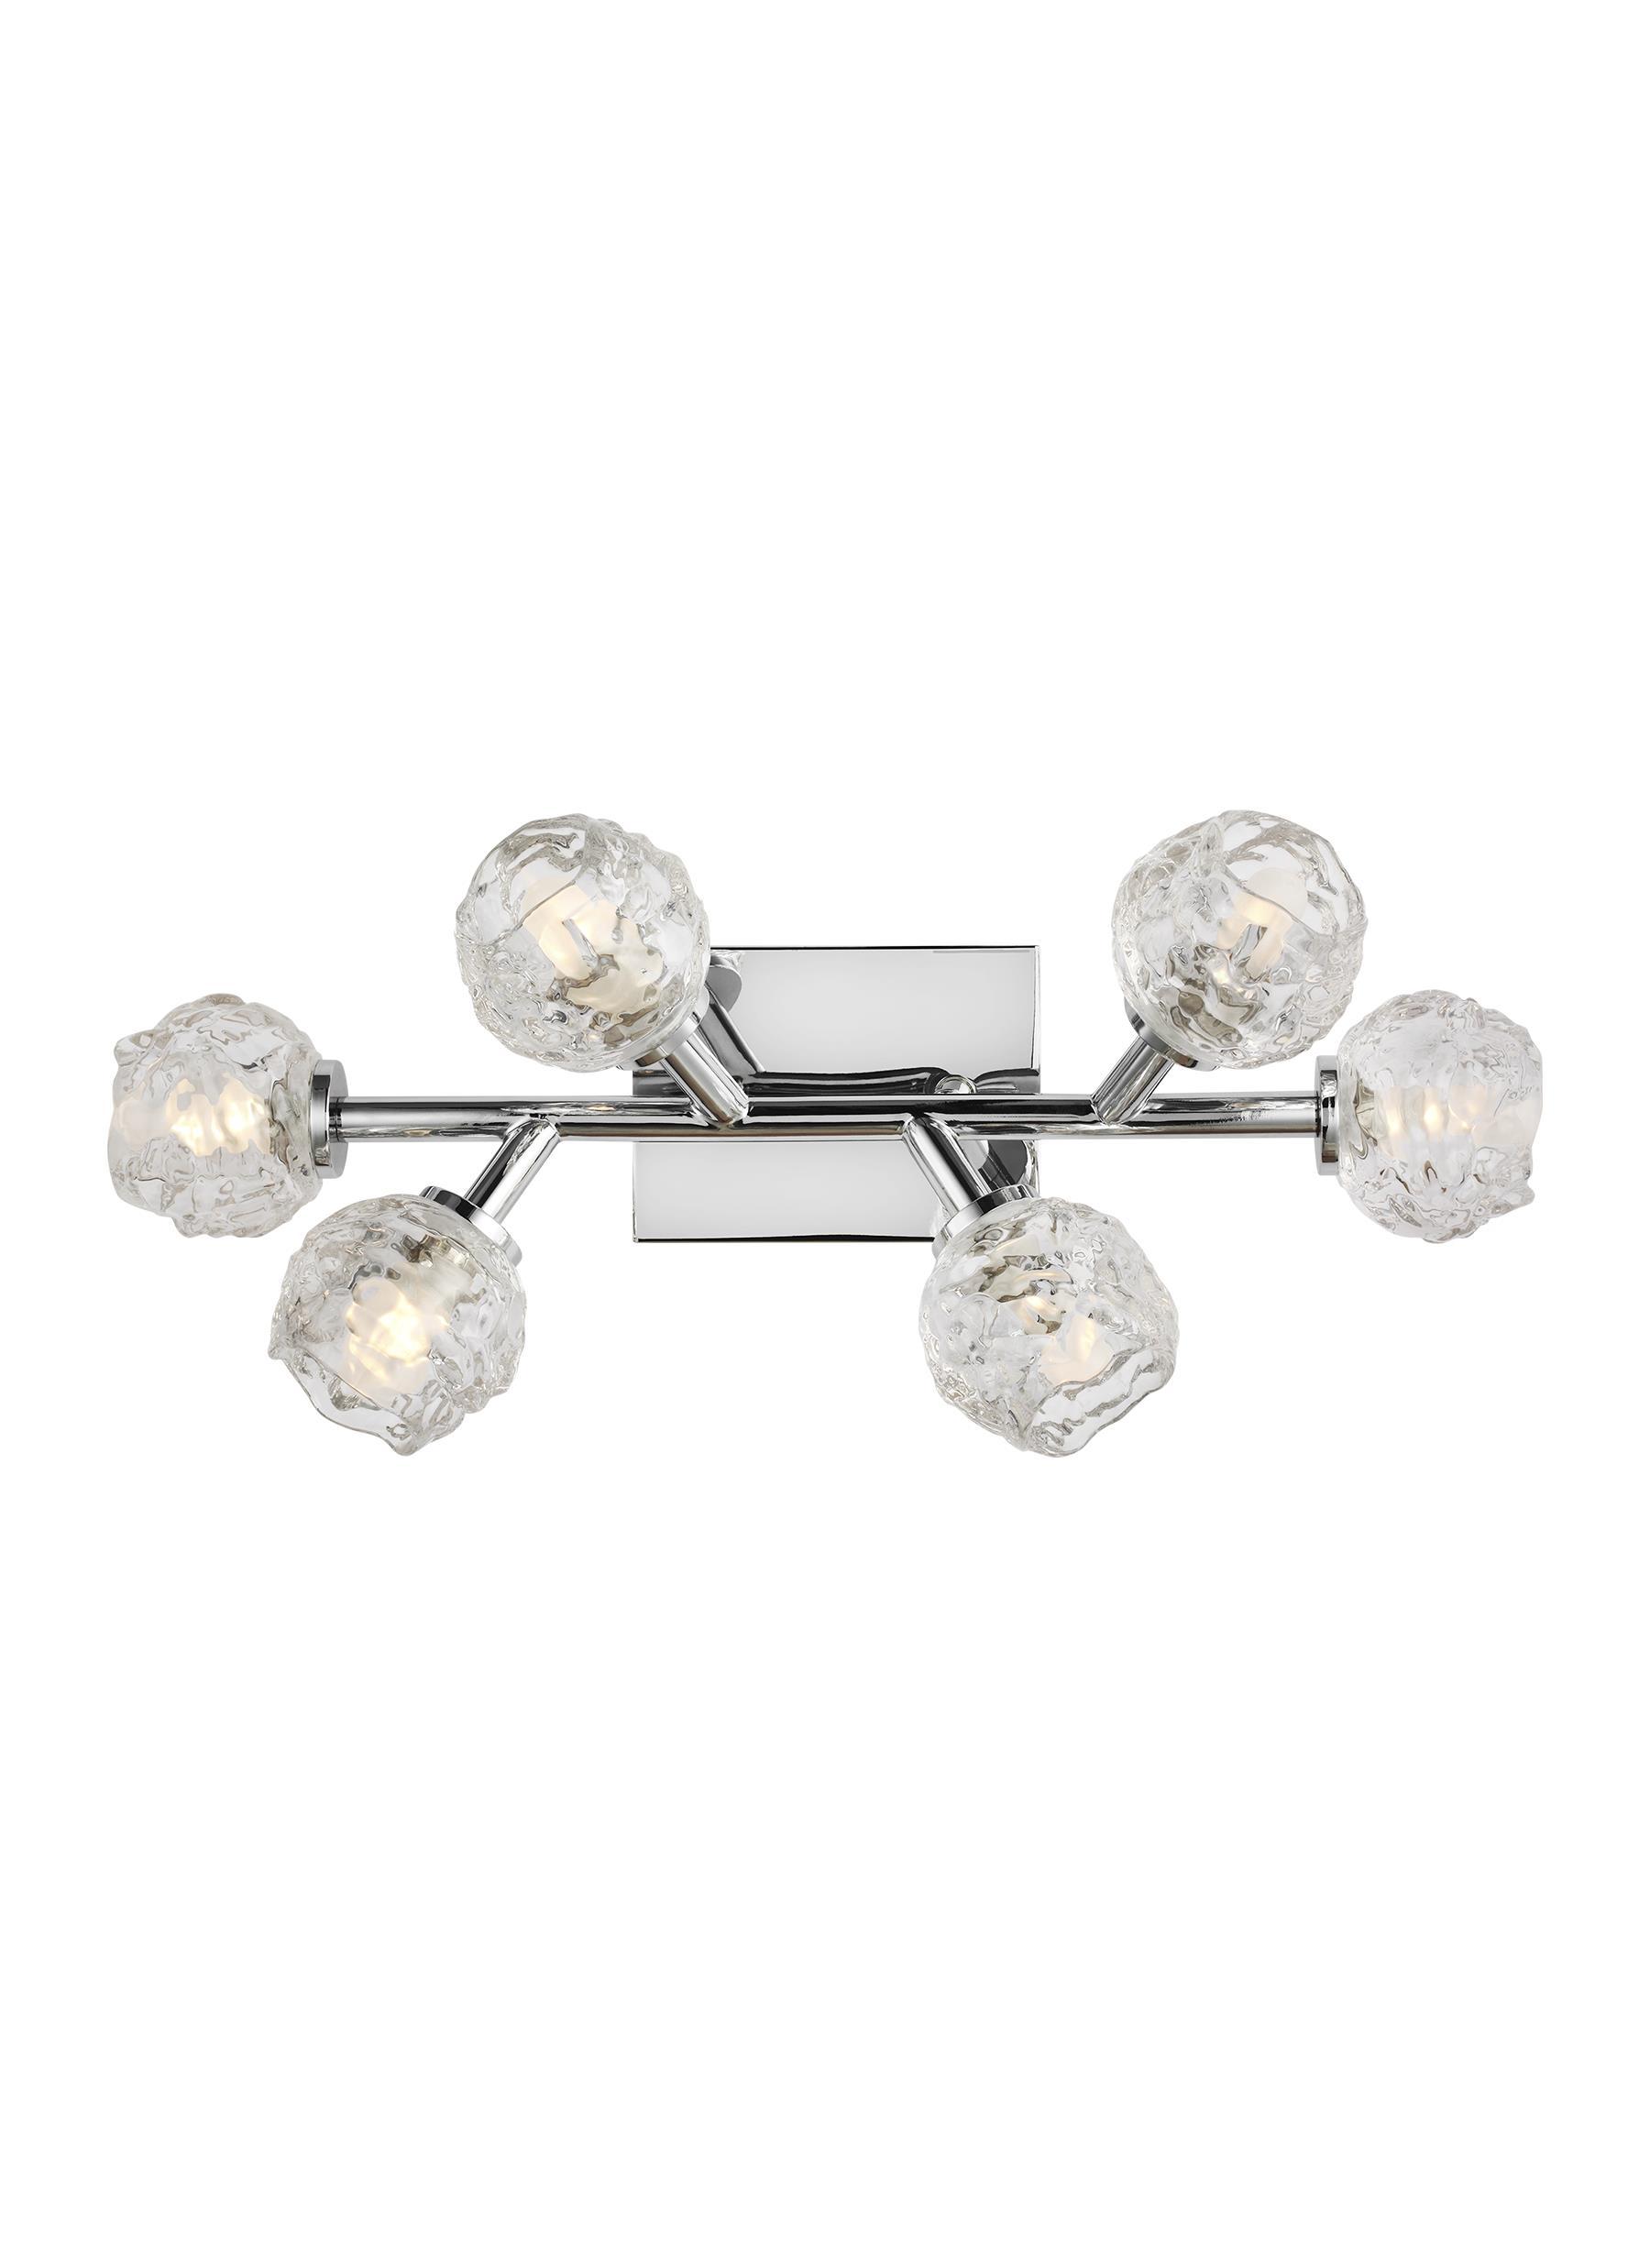 Vs24336ch l16 light vanitychrome loading zoom aloadofball Gallery